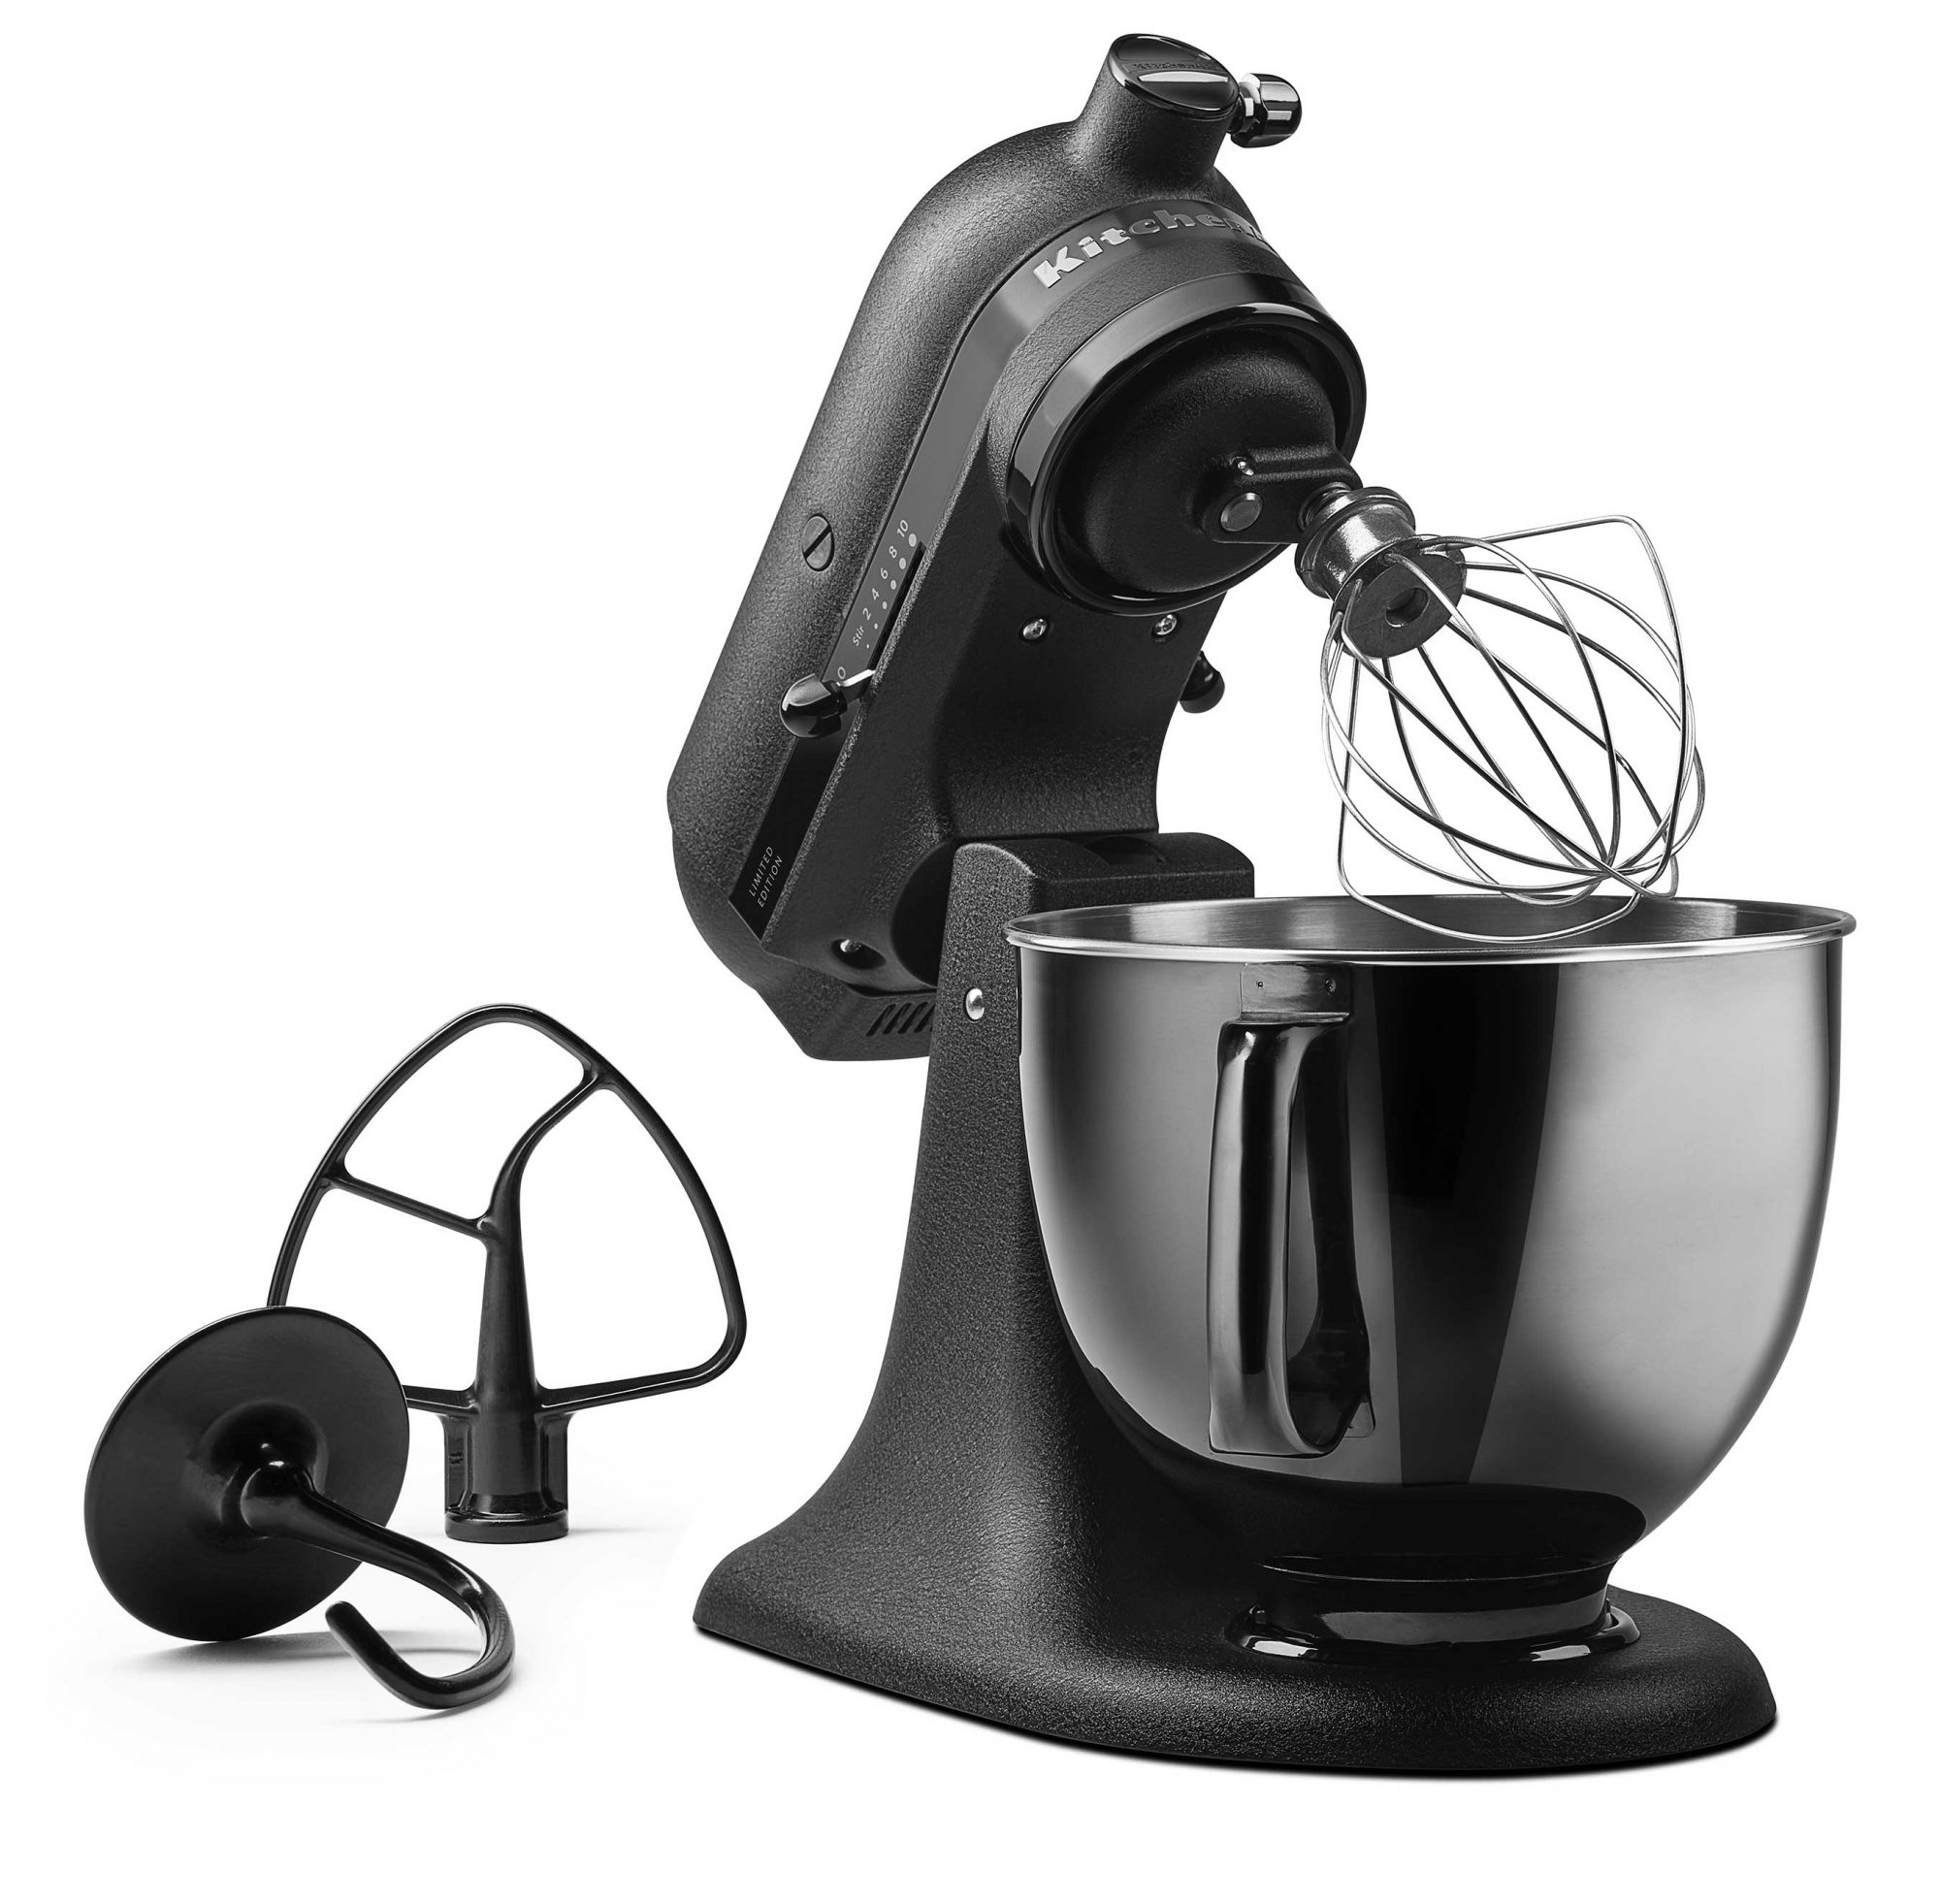 kitchenaid-black-stand-mixer-image